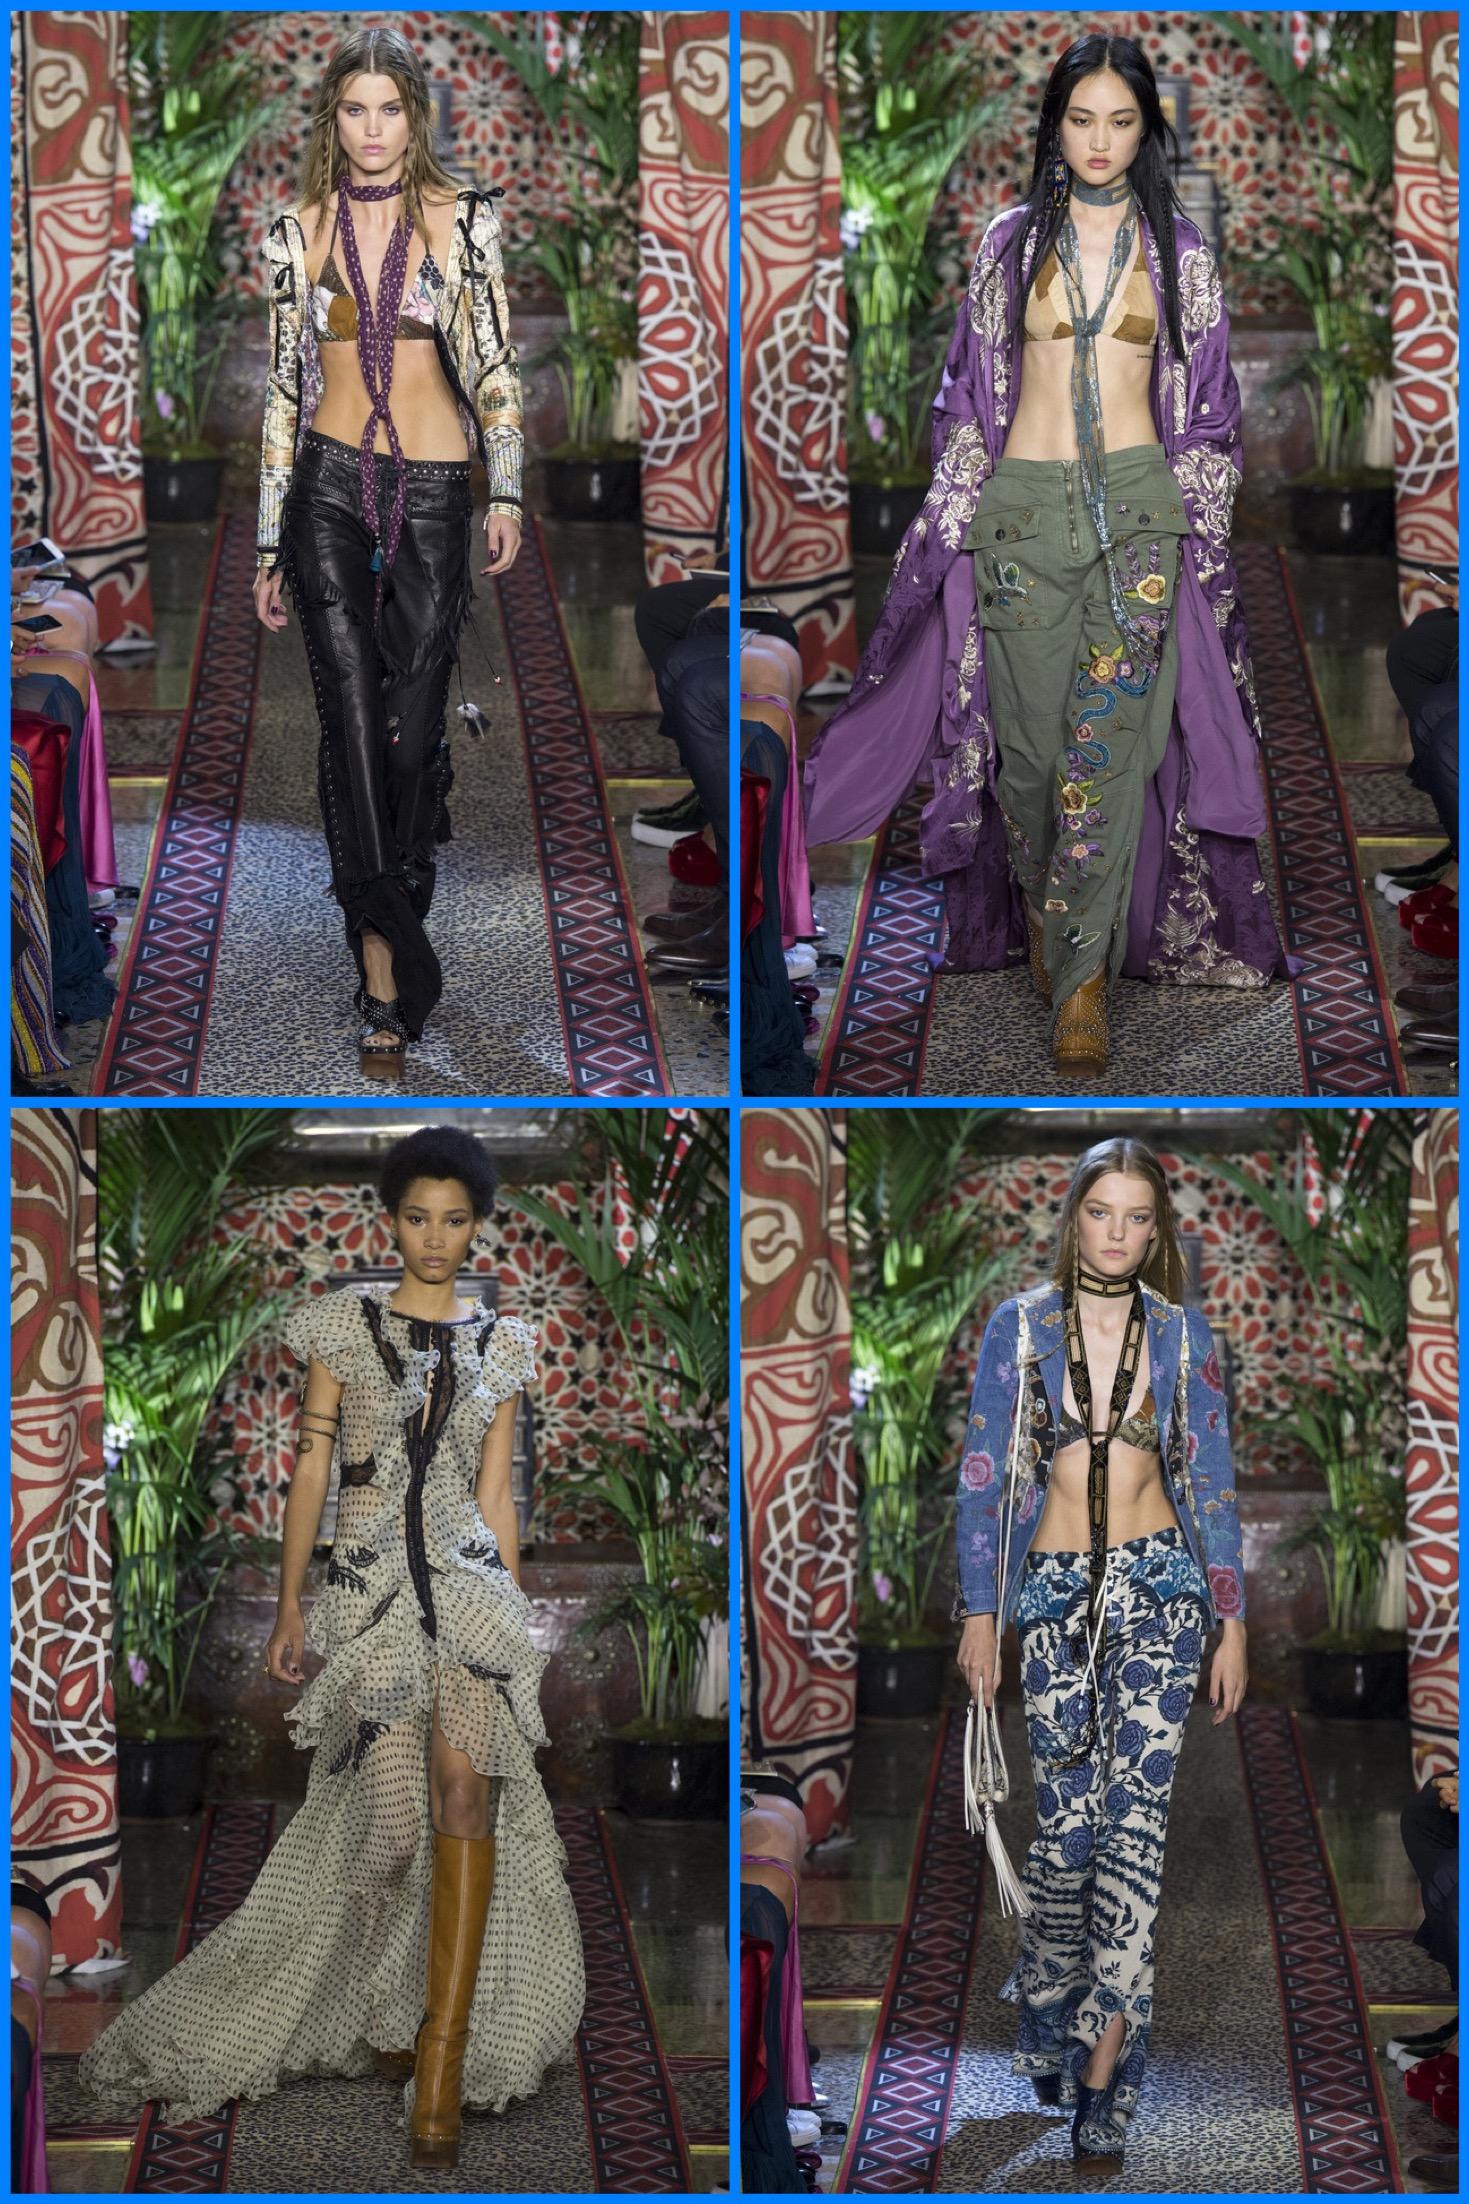 milano-fashion-week-pret-a-porter-spring-summer-2017-style-roberto-cavalli